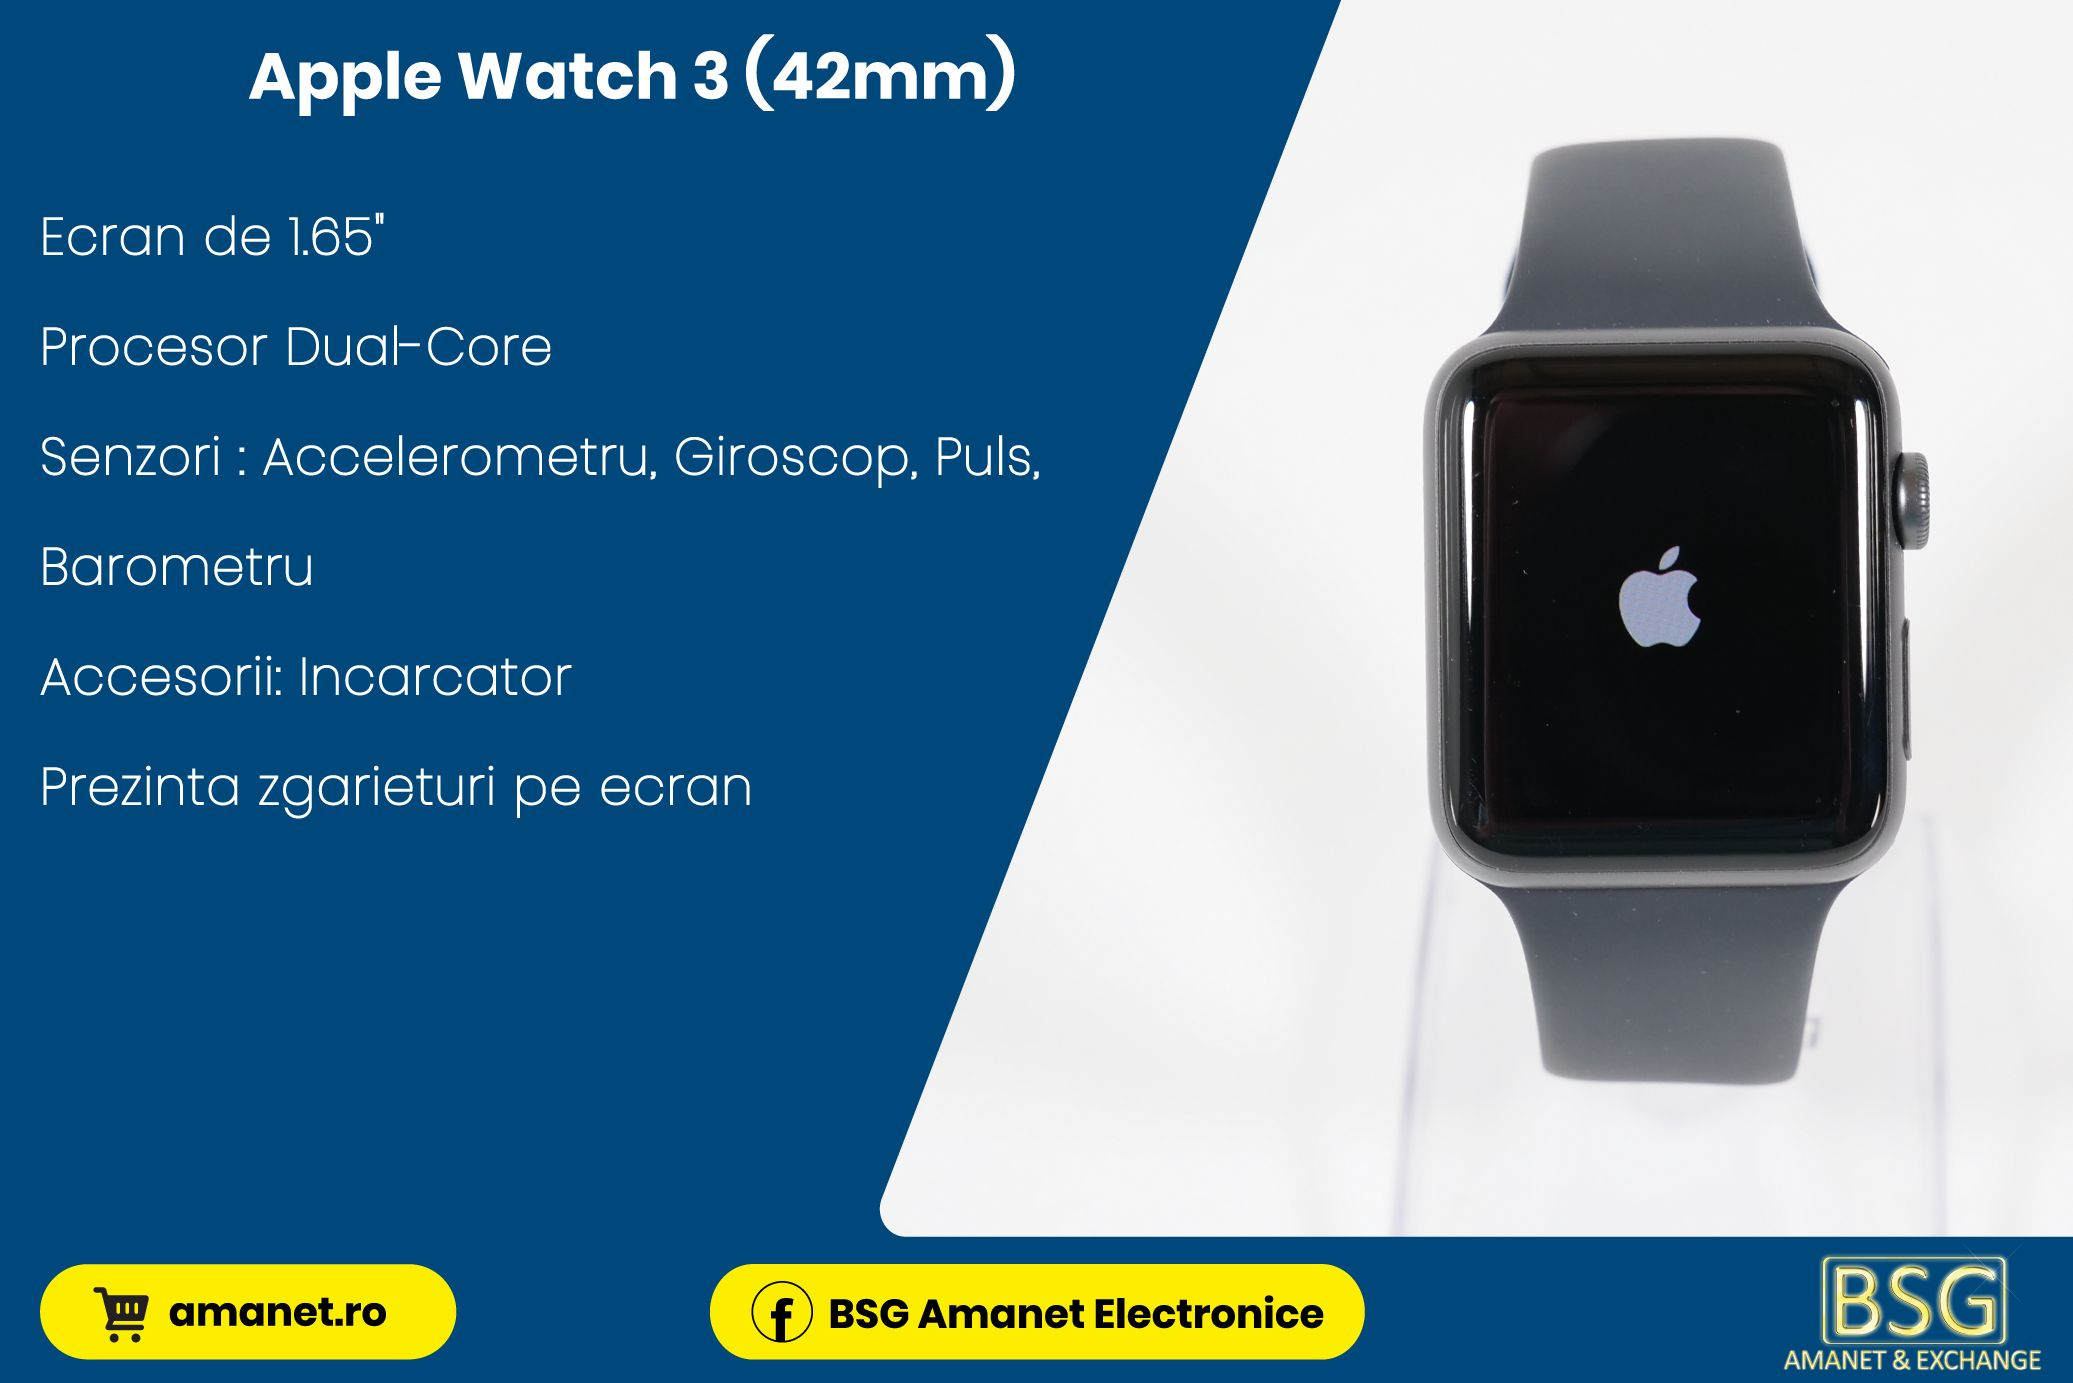 Smartwatch Apple Watch 3 (42mm) - BSG Amanet & Exchange